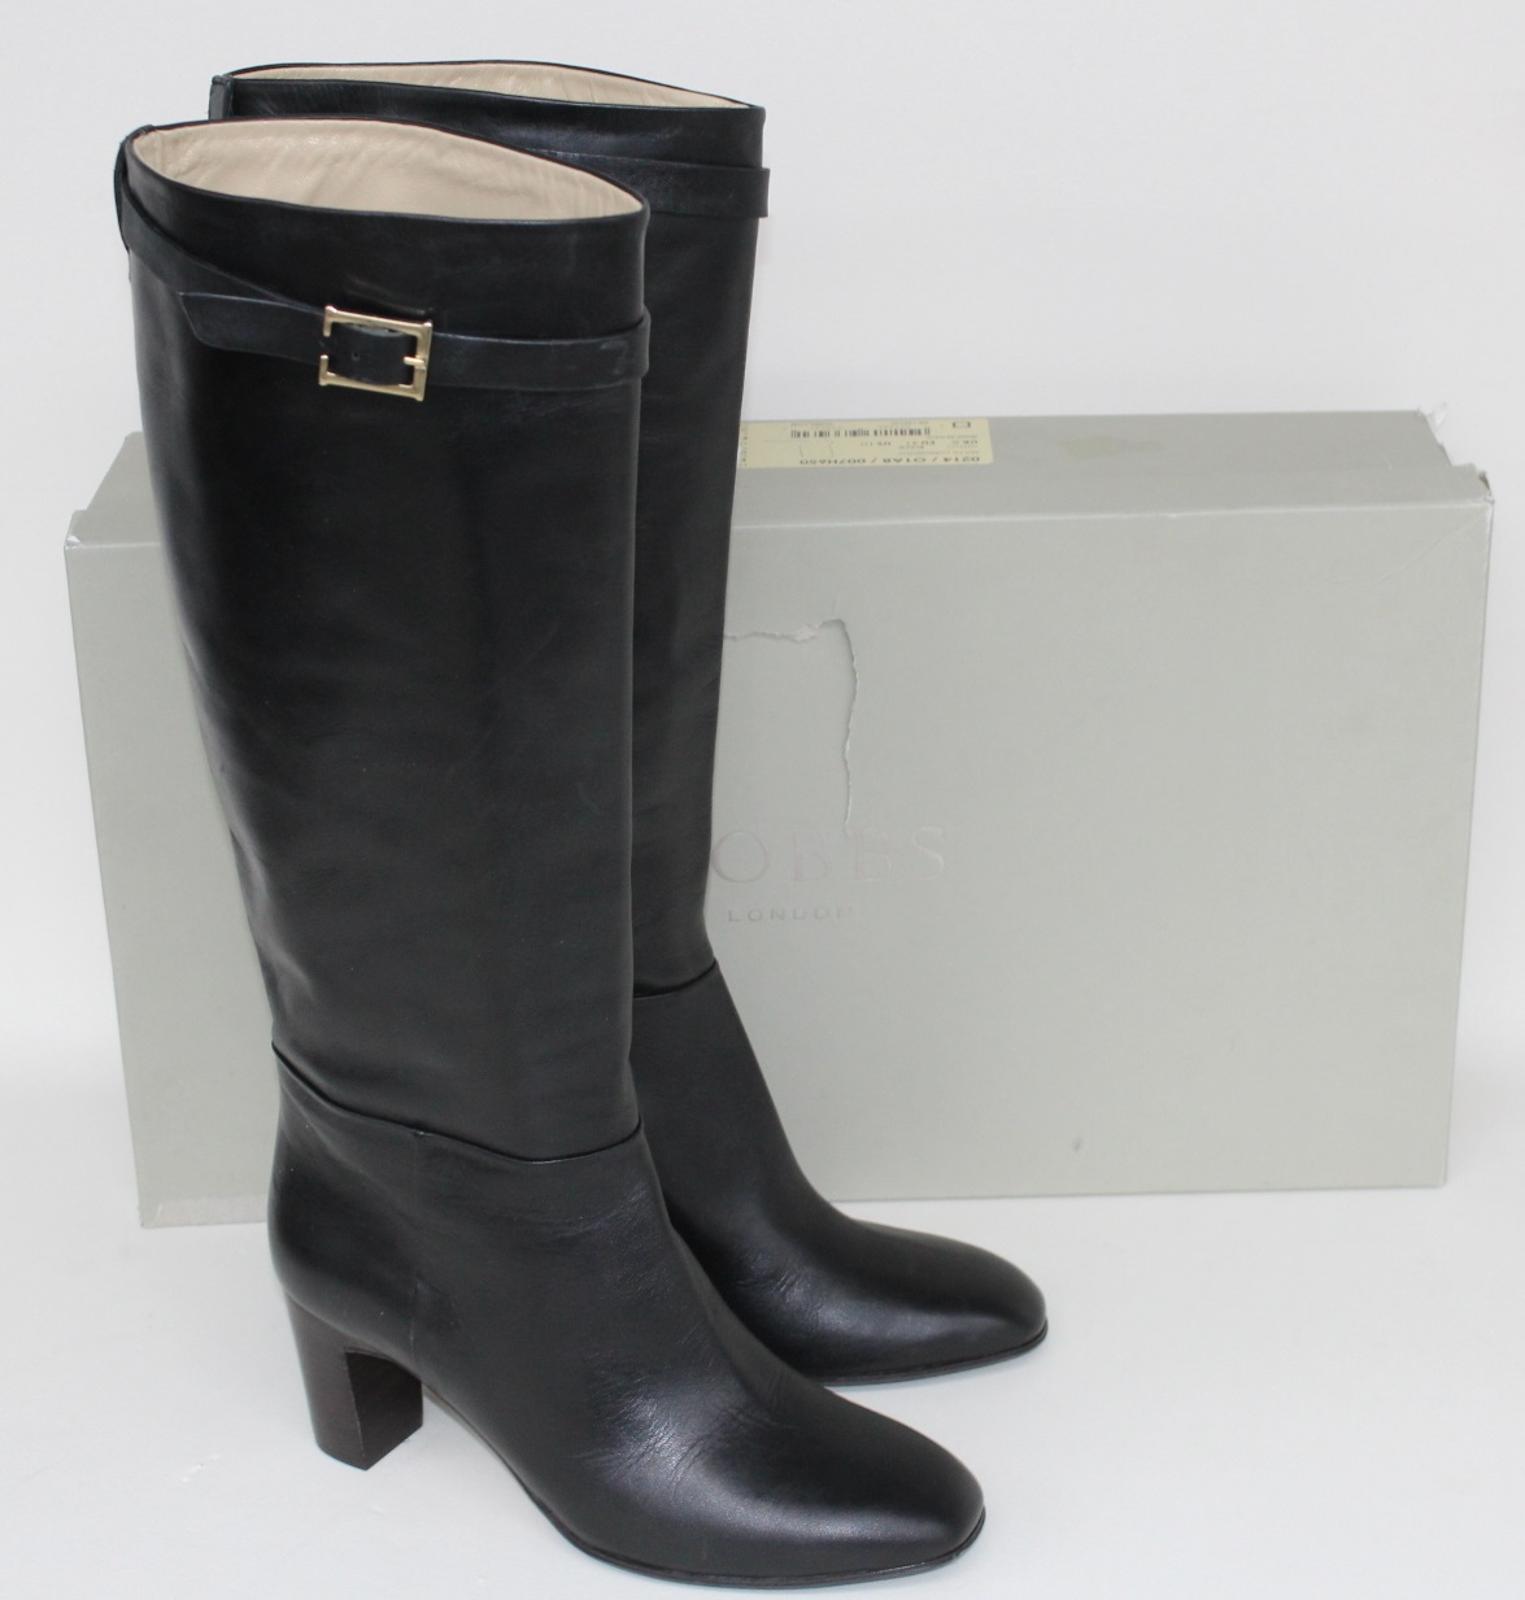 Hobbs-Senoras-Rodilla-Tacon-Maya-Cuero-Negro-Botas-De-Montar-UK8-EU41-Nuevo miniatura 2